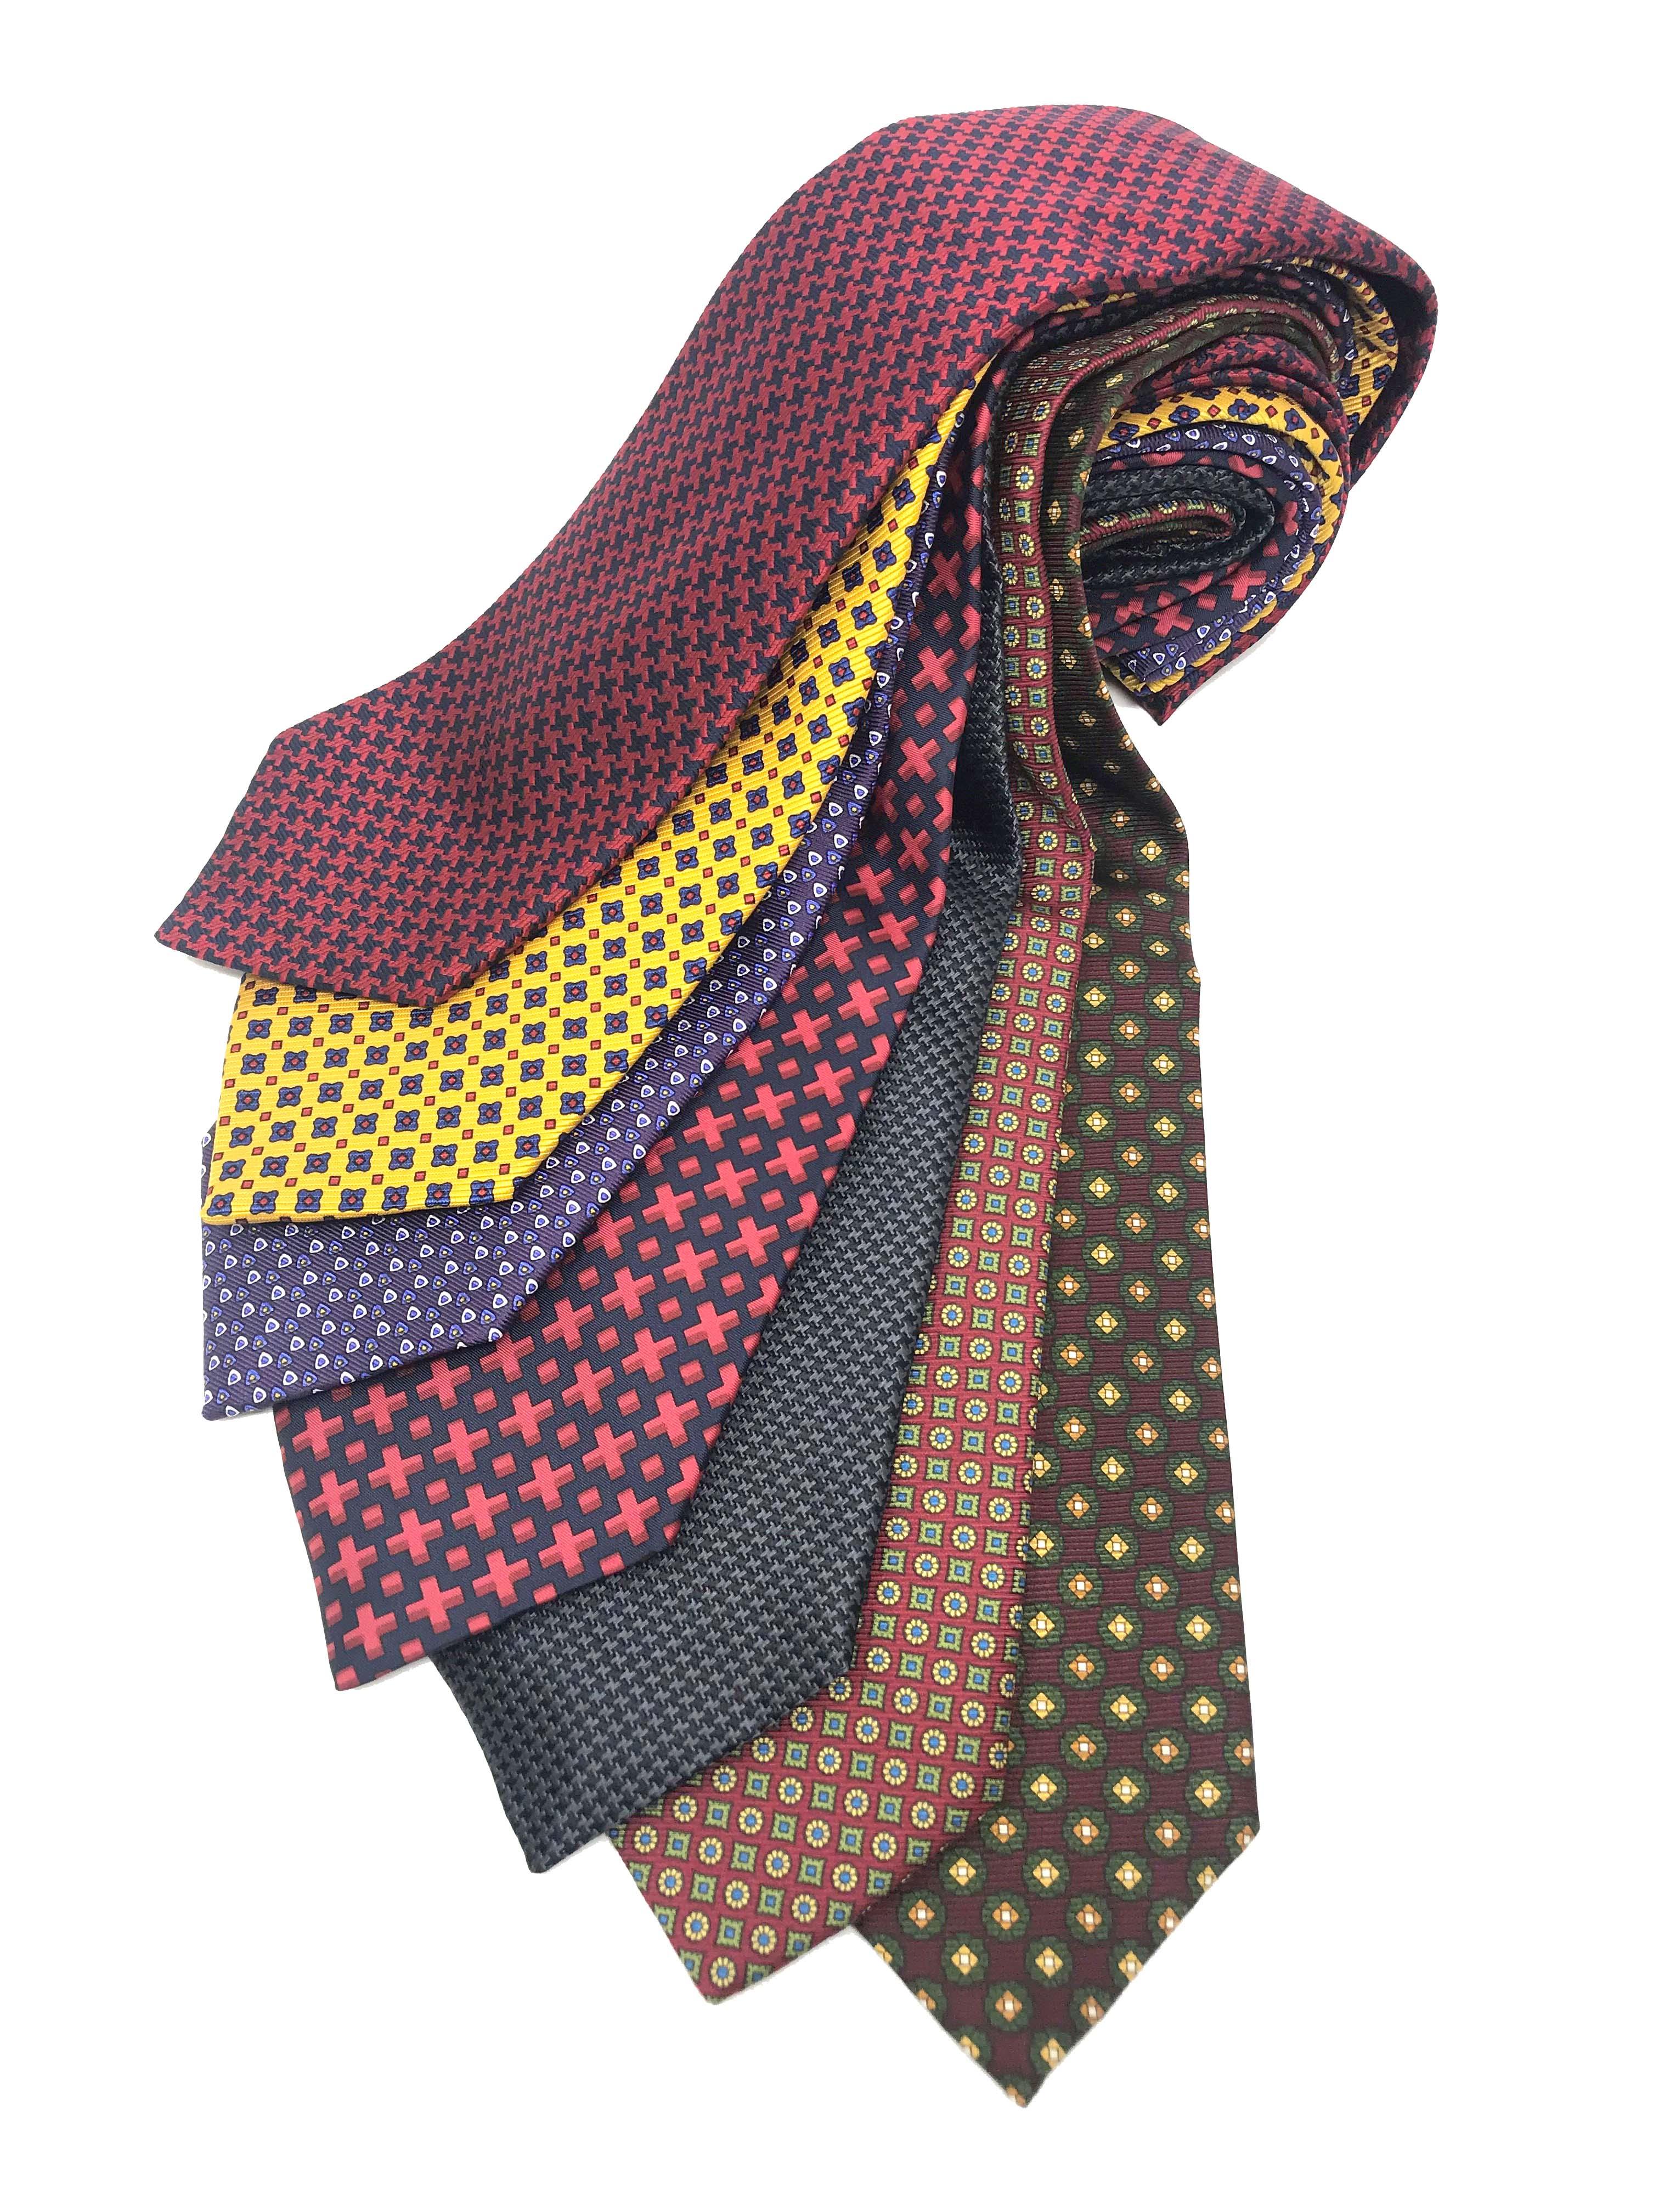 7 Piece Silk Tie Sets